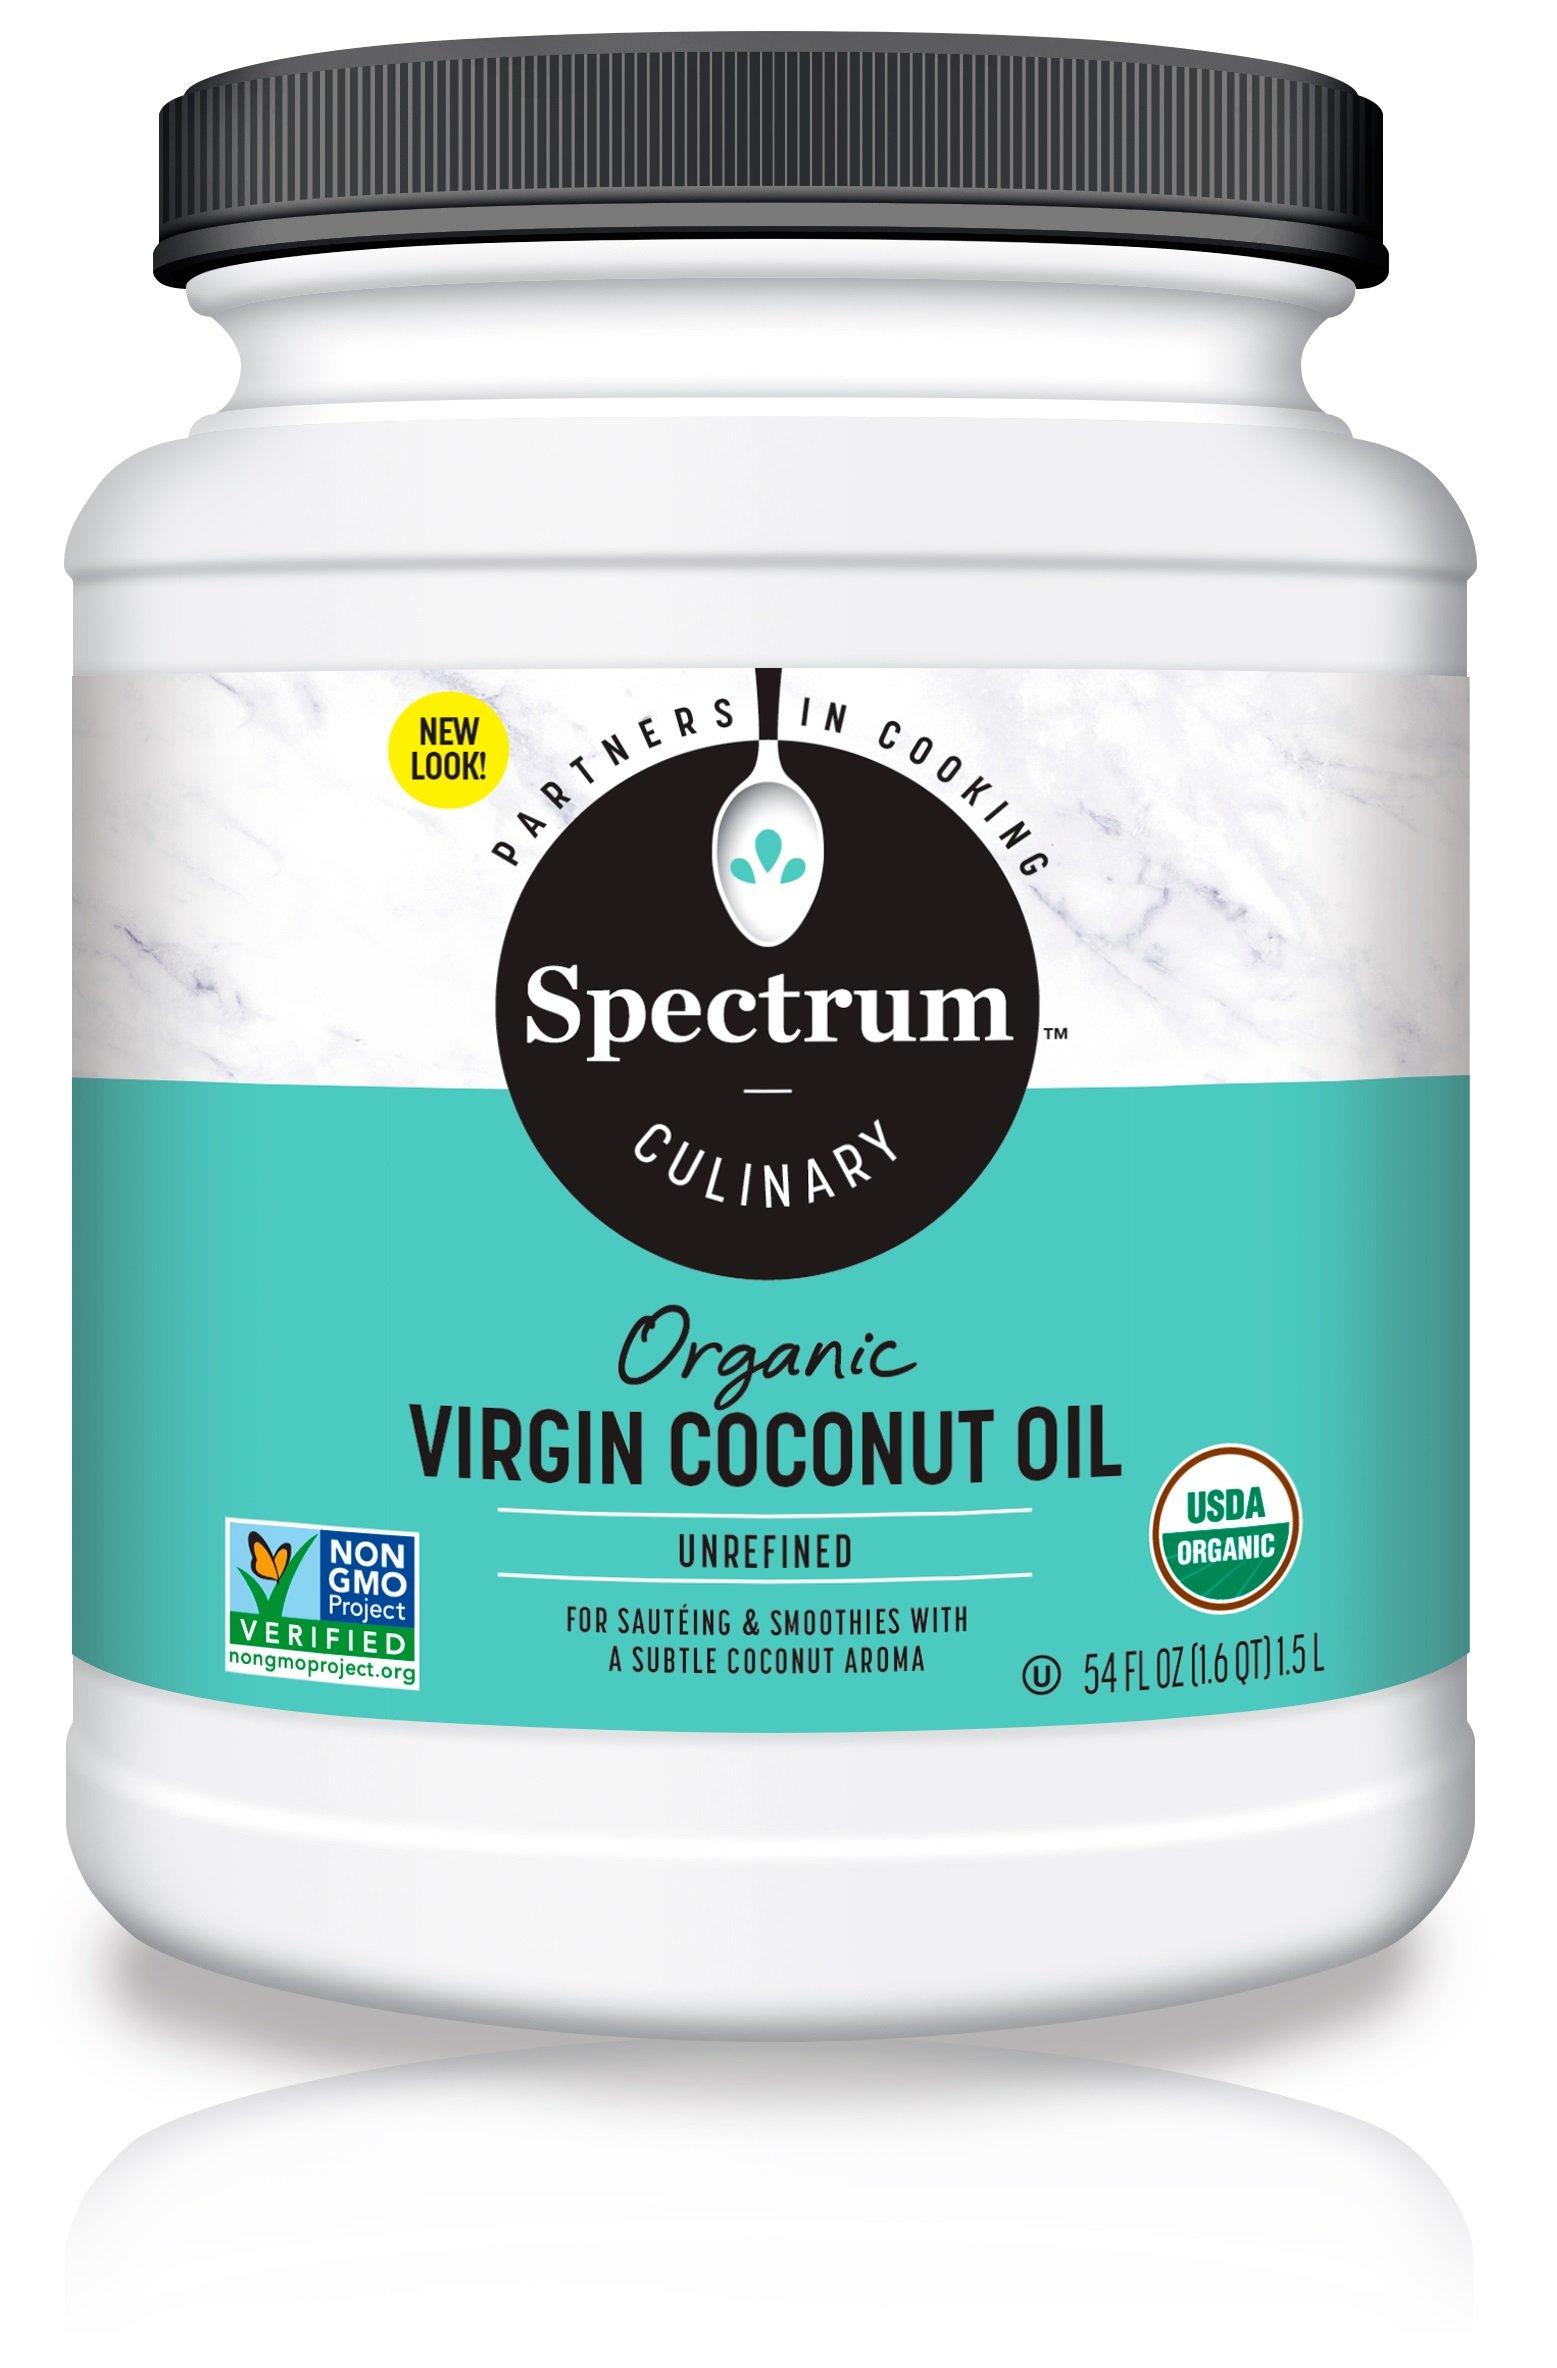 Spectrum Organic Coconut Oil for Cooking, Virgin, Unrefined, 54 fl. oz. by Spectrum (Image #1)